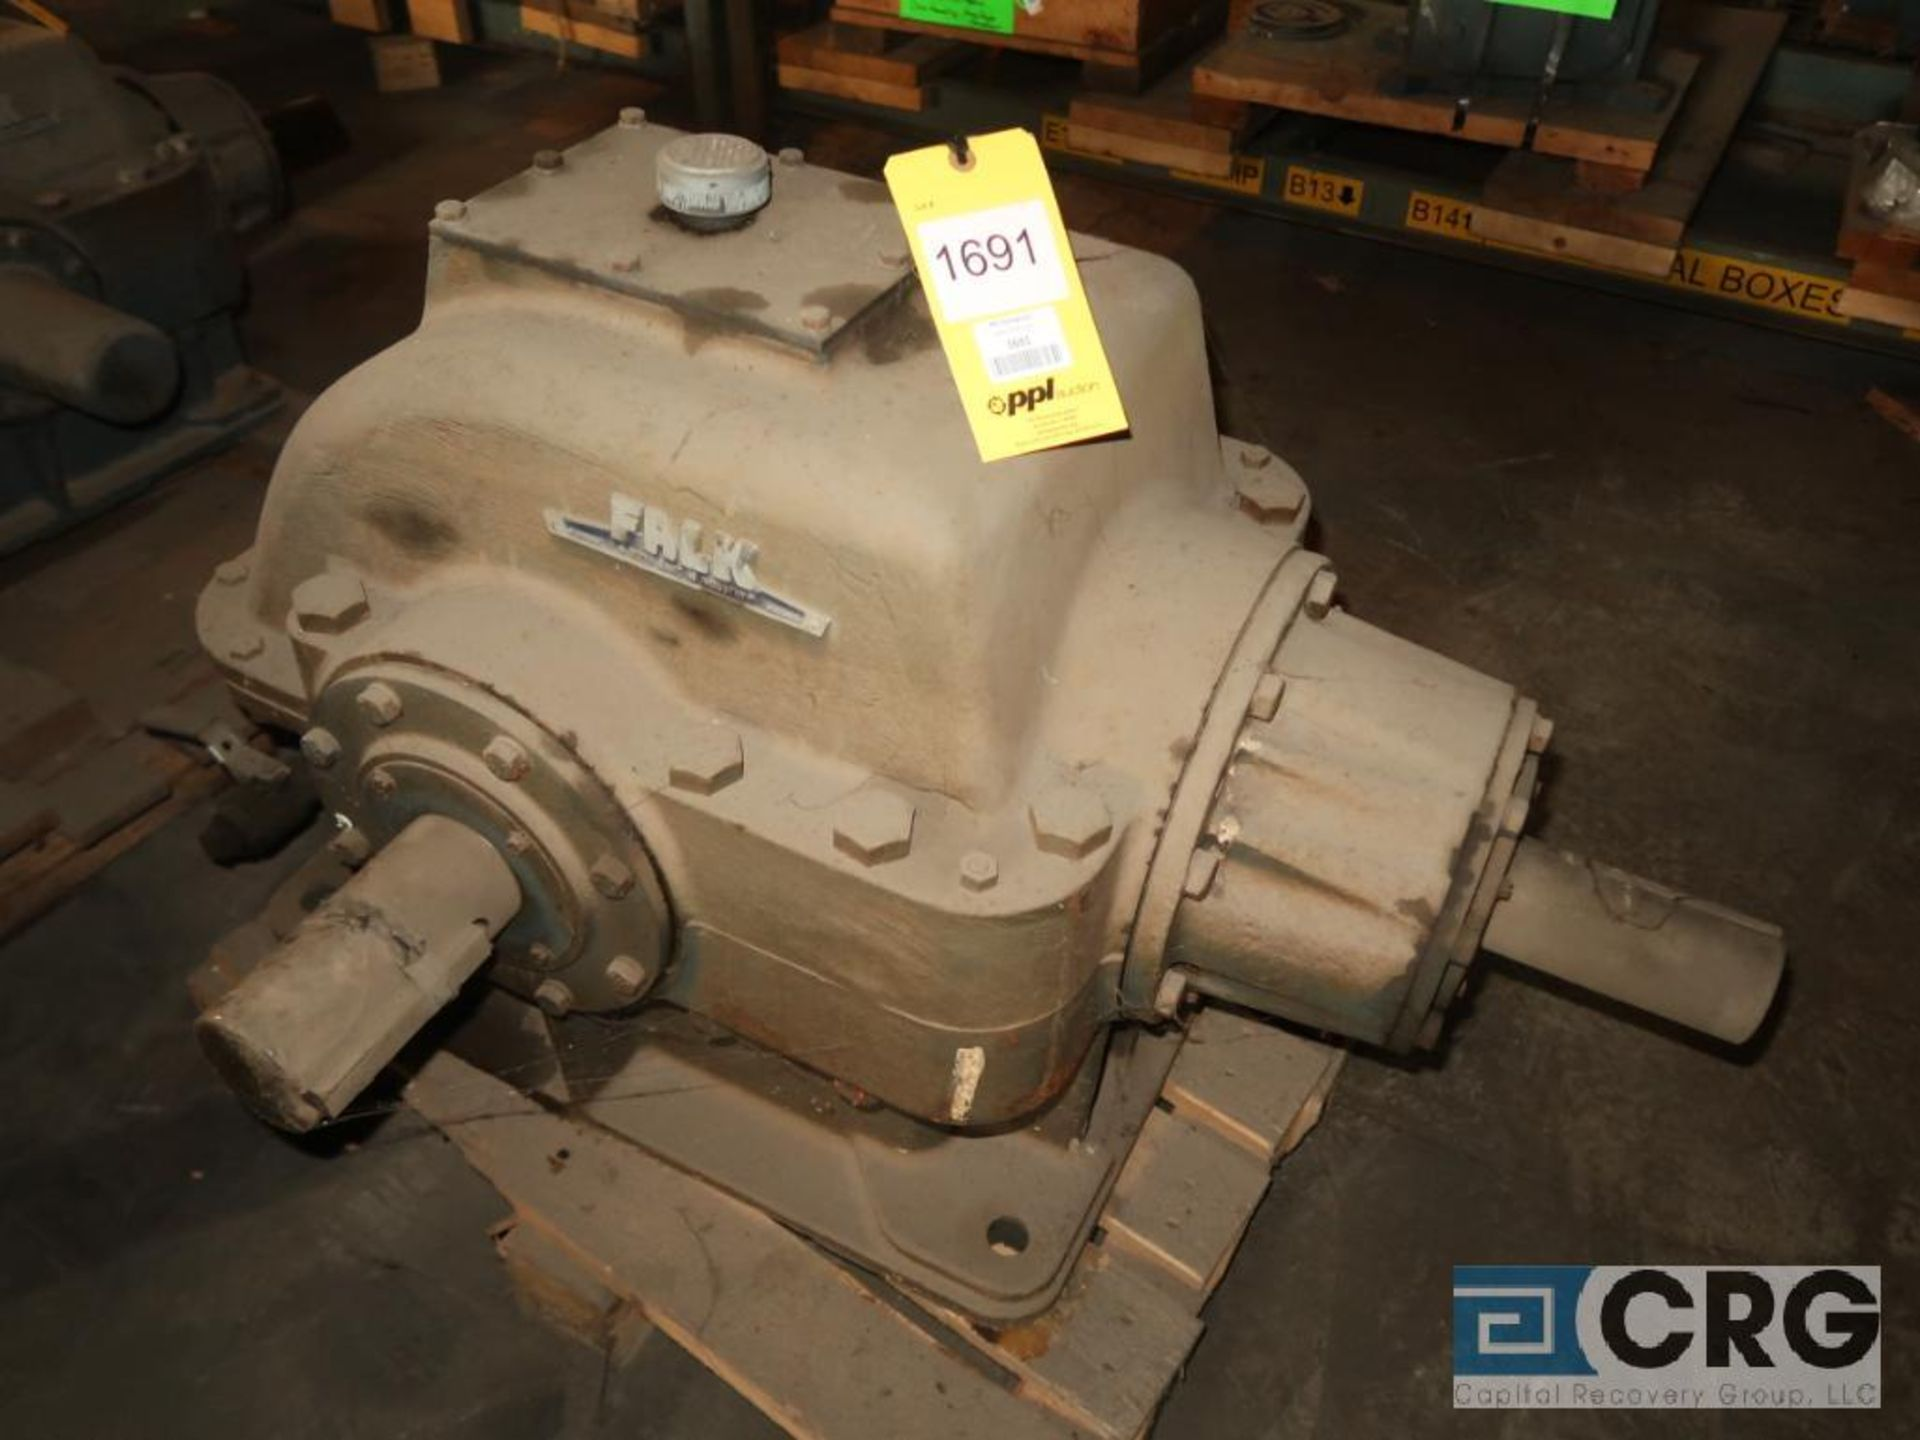 Falk 20906 GHB1 KD gear drive, ratio-1.481, input RPM 788.19, output RPM 532.2, service rate HP.